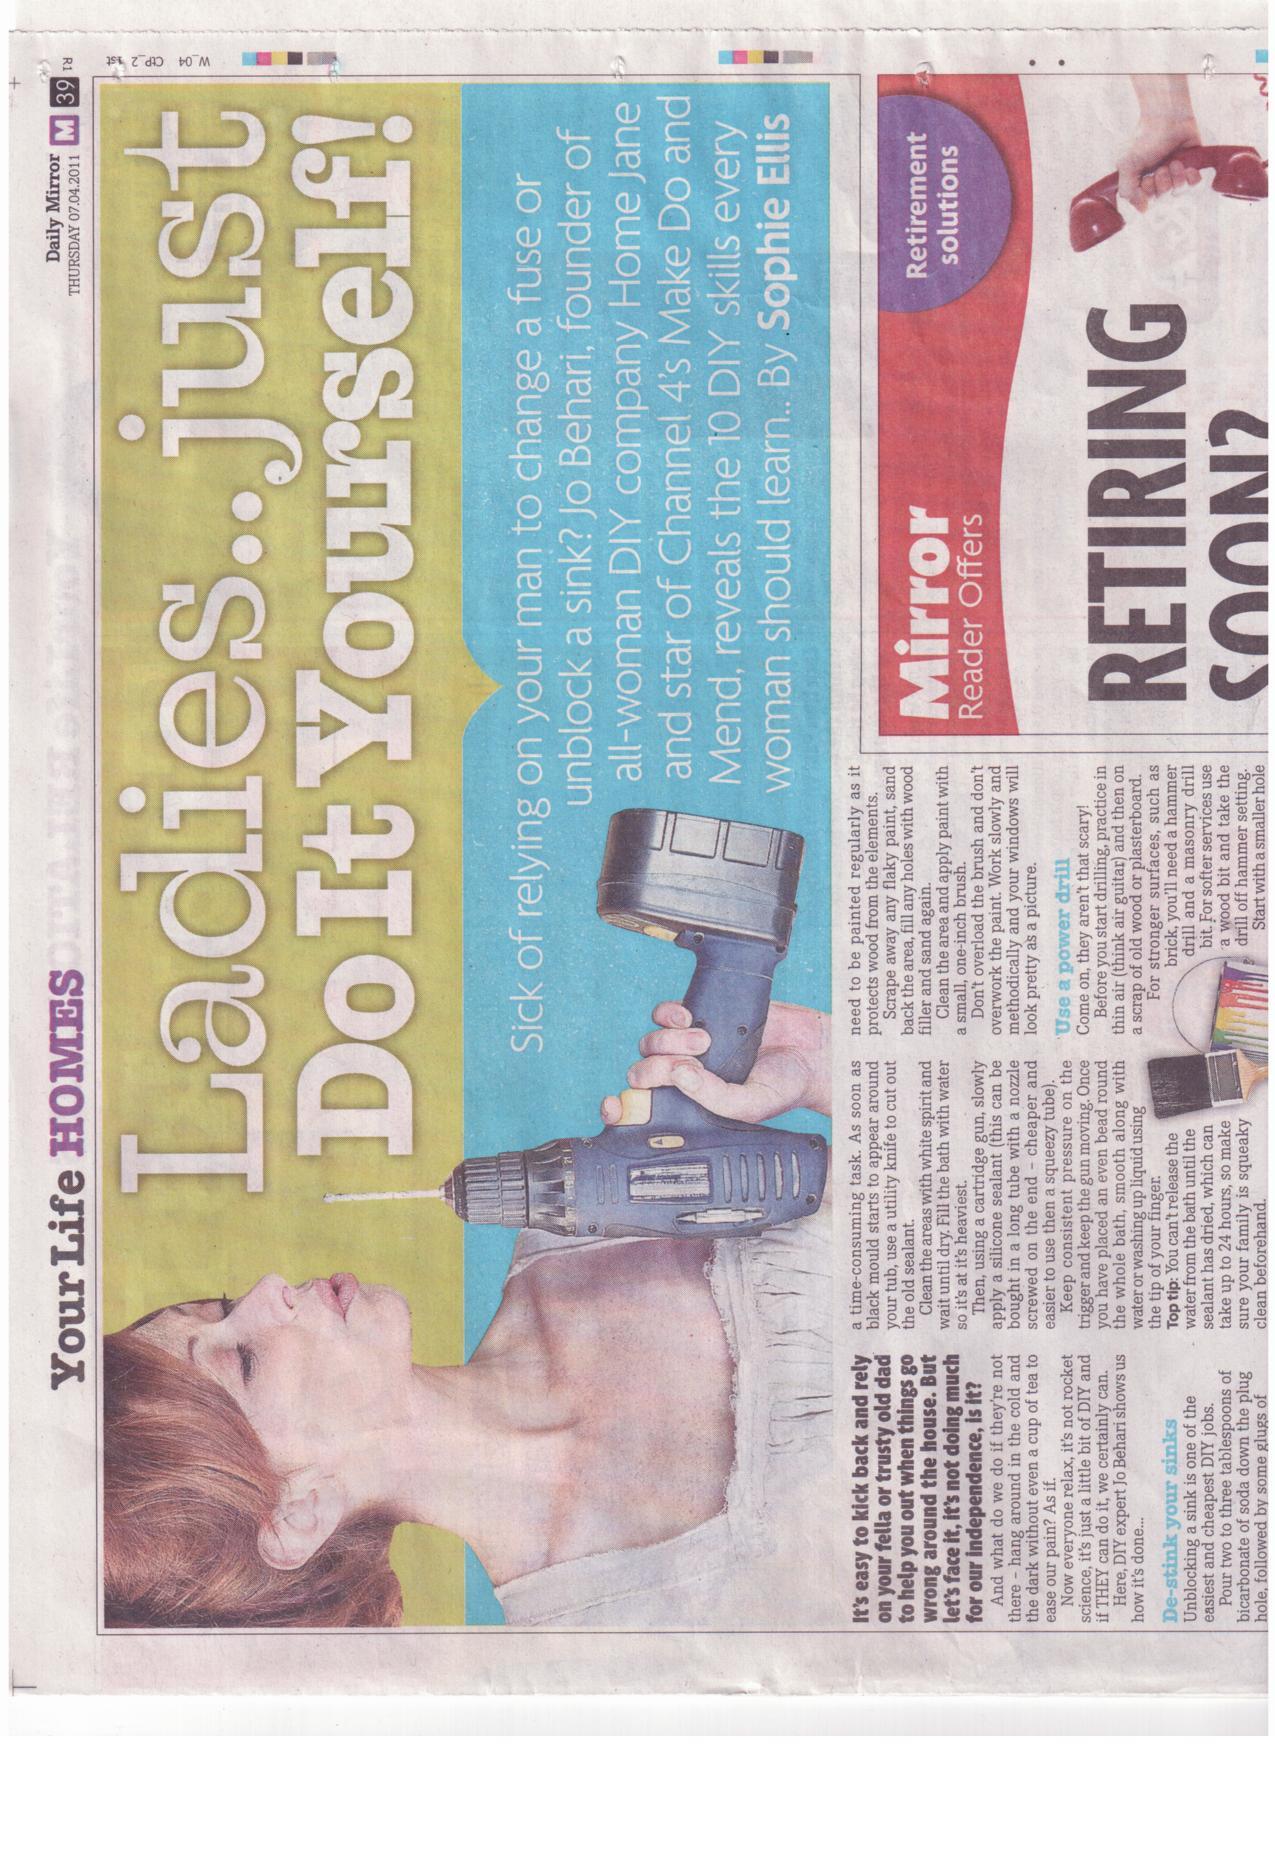 Daily Mirror April 2011